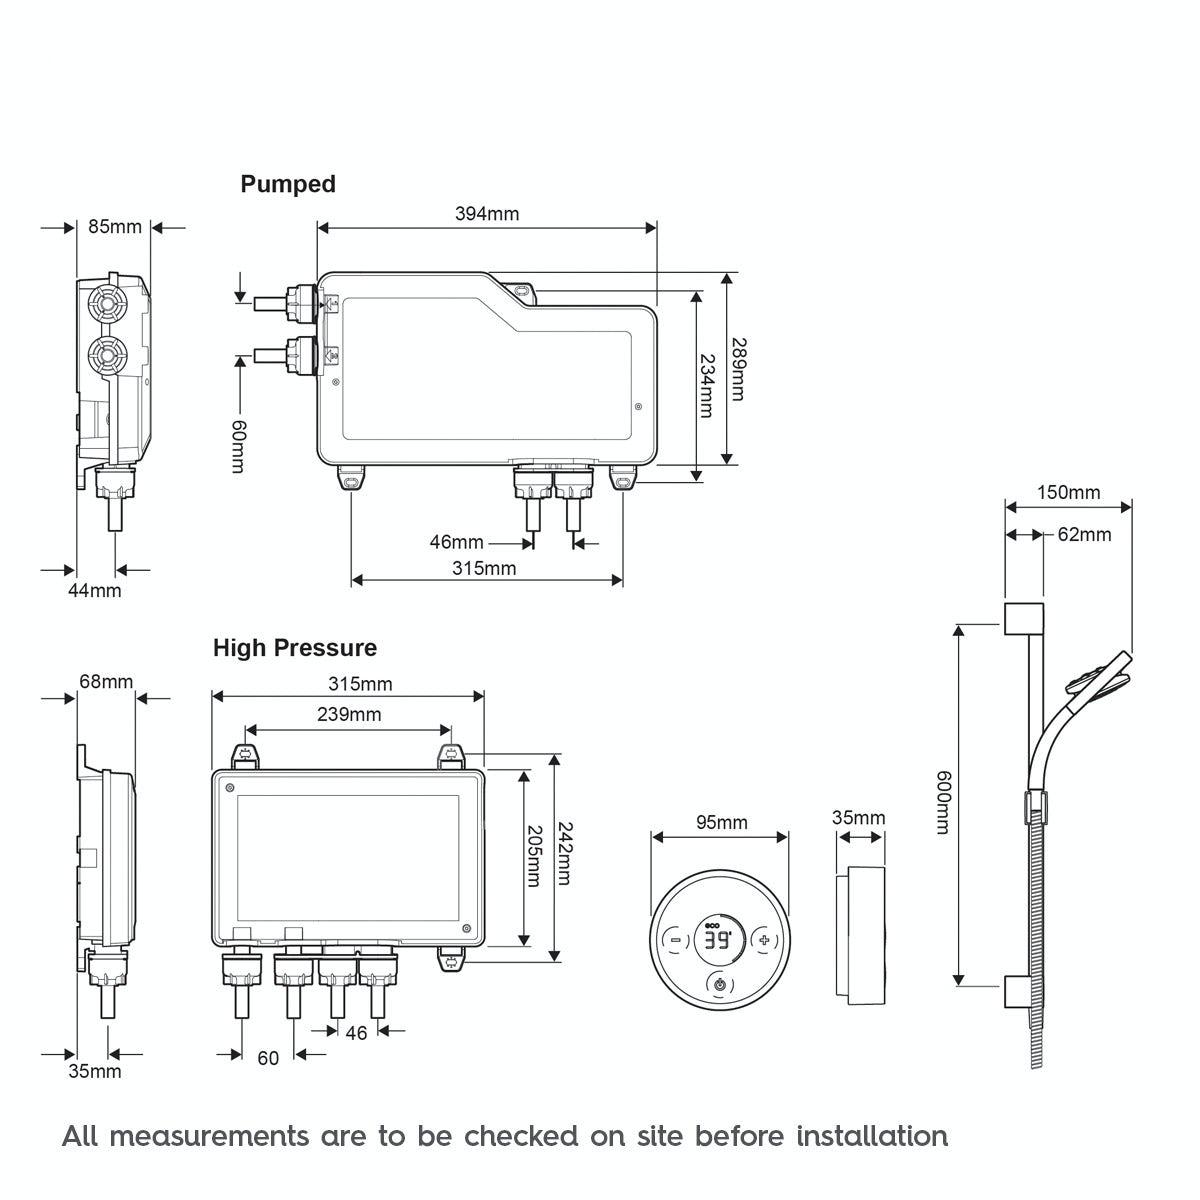 Dimensions for Mira Platinum rear fed digital shower pumped